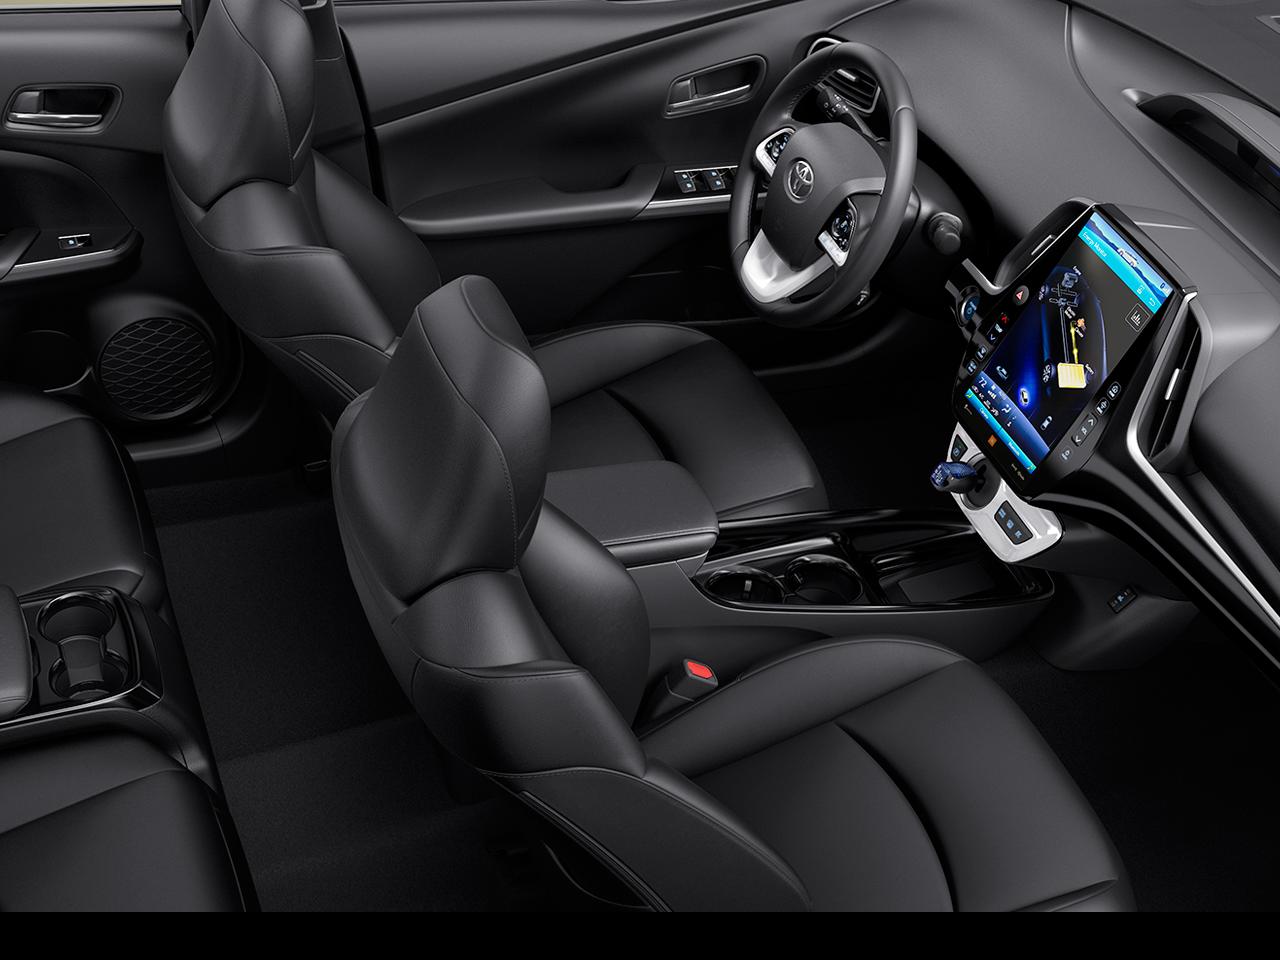 Research The 2017 Toyota Prius Prime near San Diego